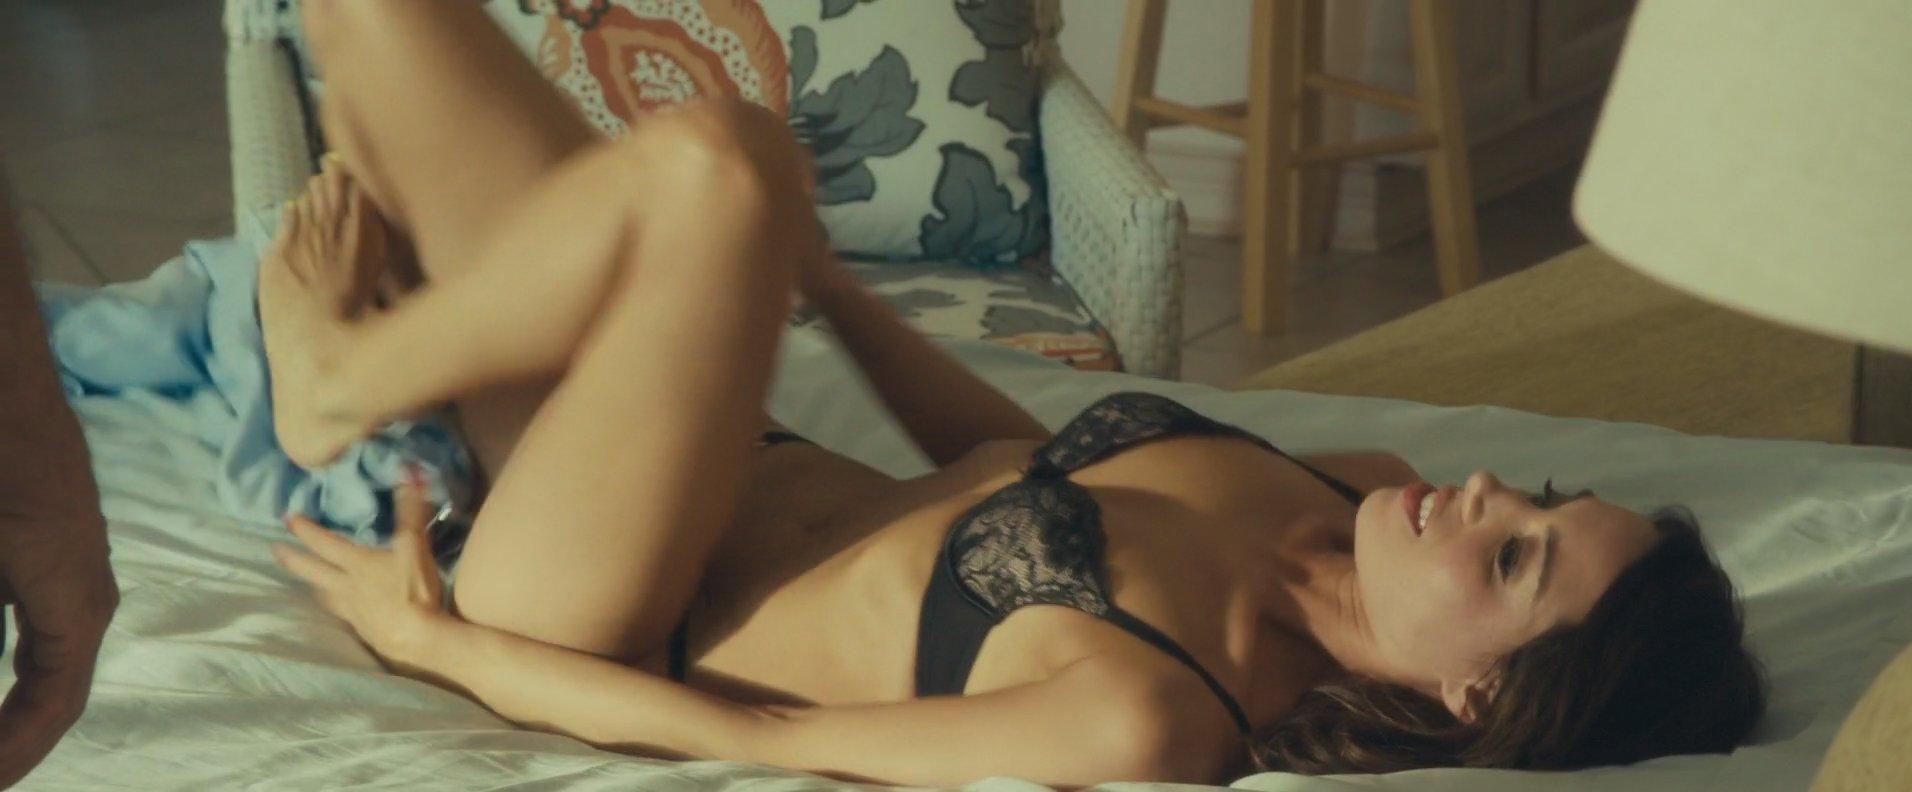 aubrey plaza sex video